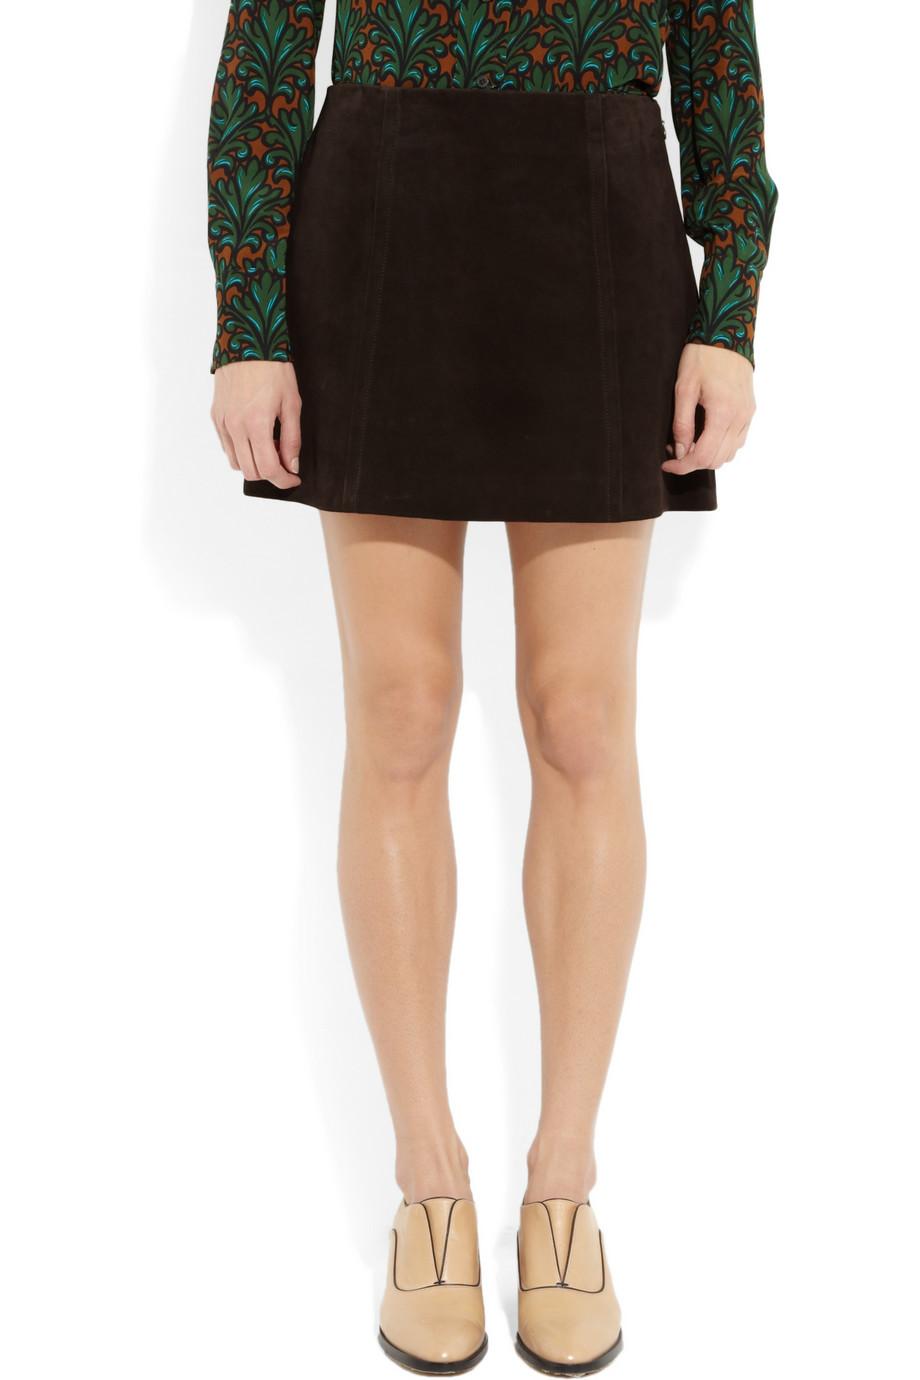 Miu miu suede mini skirt – 64% at the outnet.com